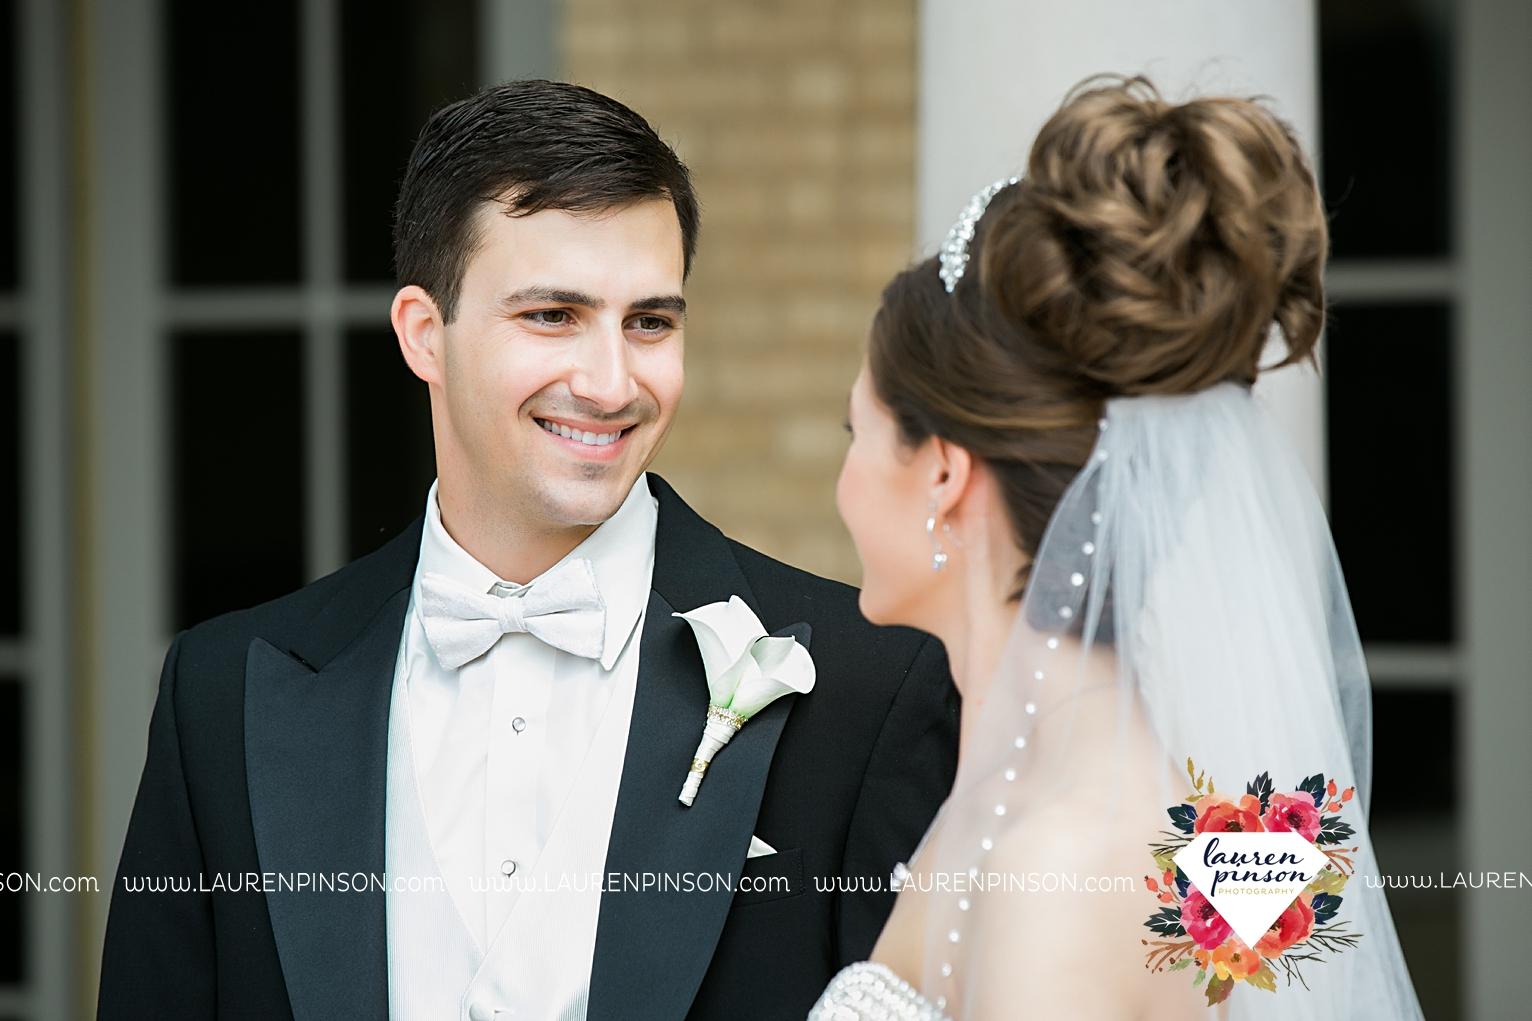 wichita-falls-texas-wedding-photographer-the-forum-by-the-kemp-mayfield-events-ulta-gold-glitter_2832.jpg